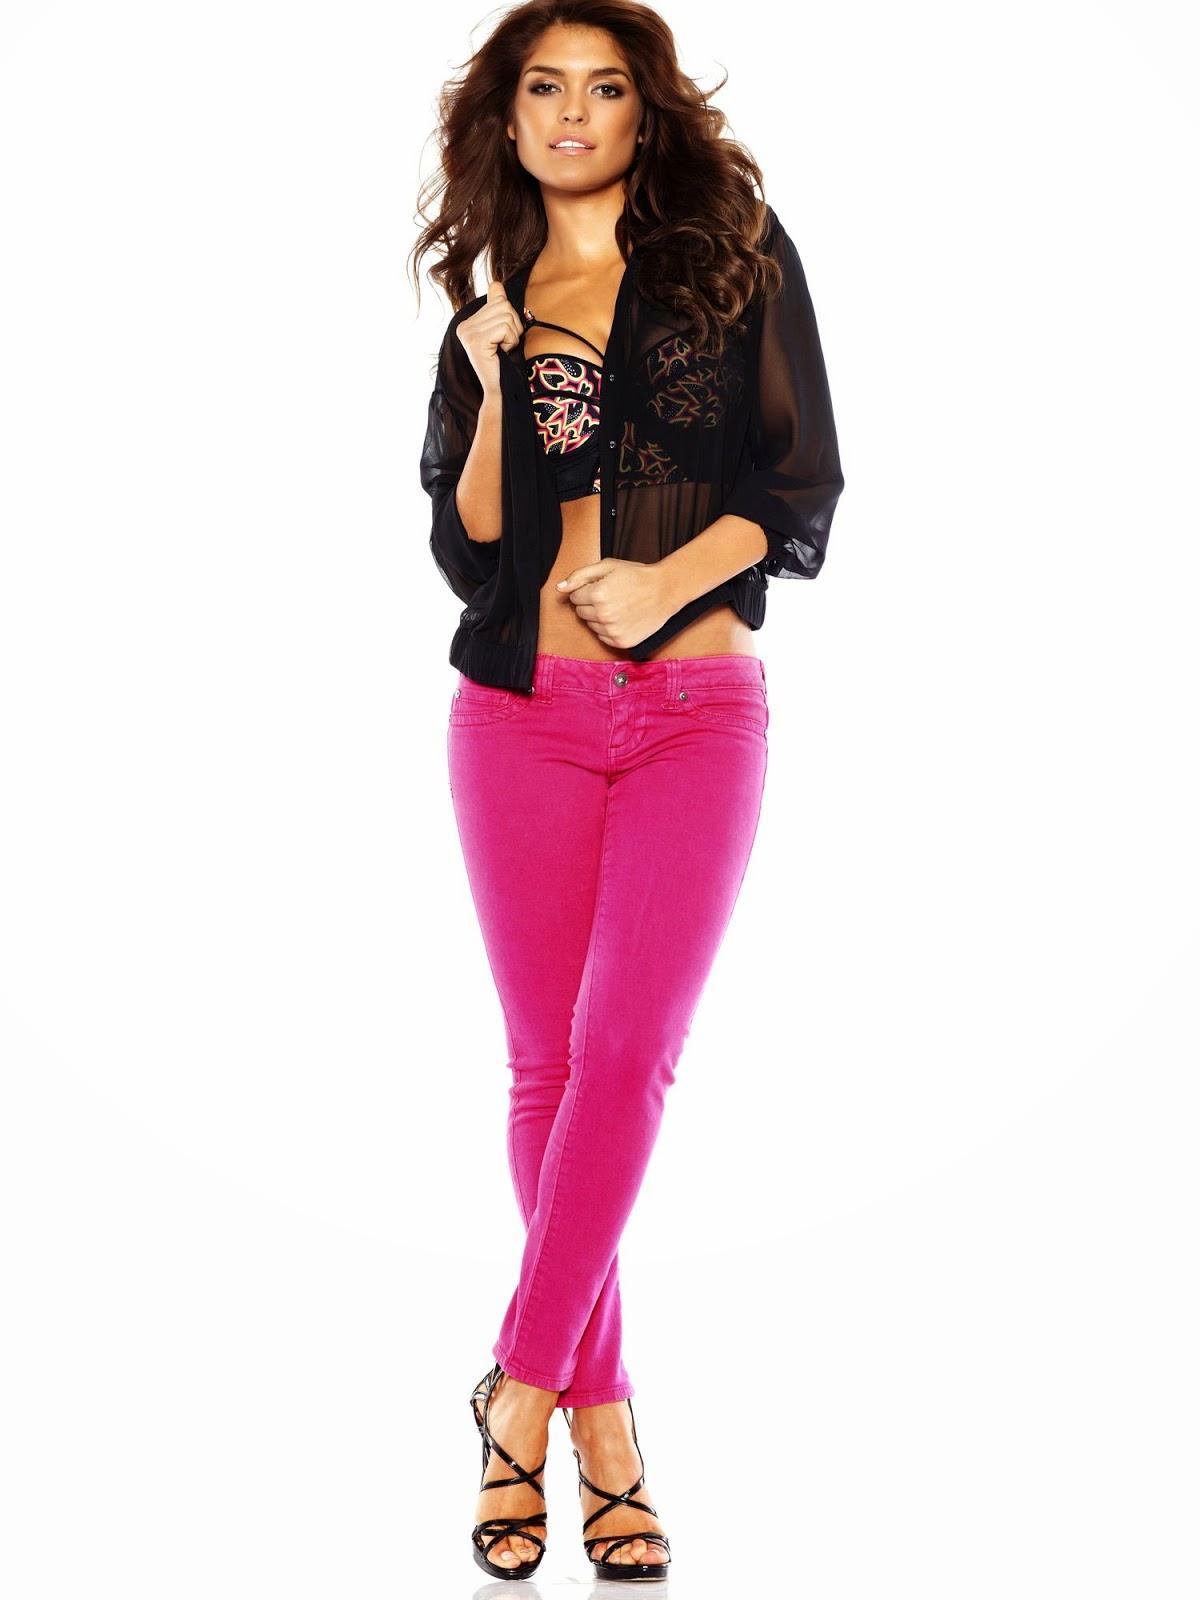 Model Photos: Pamela Burgos